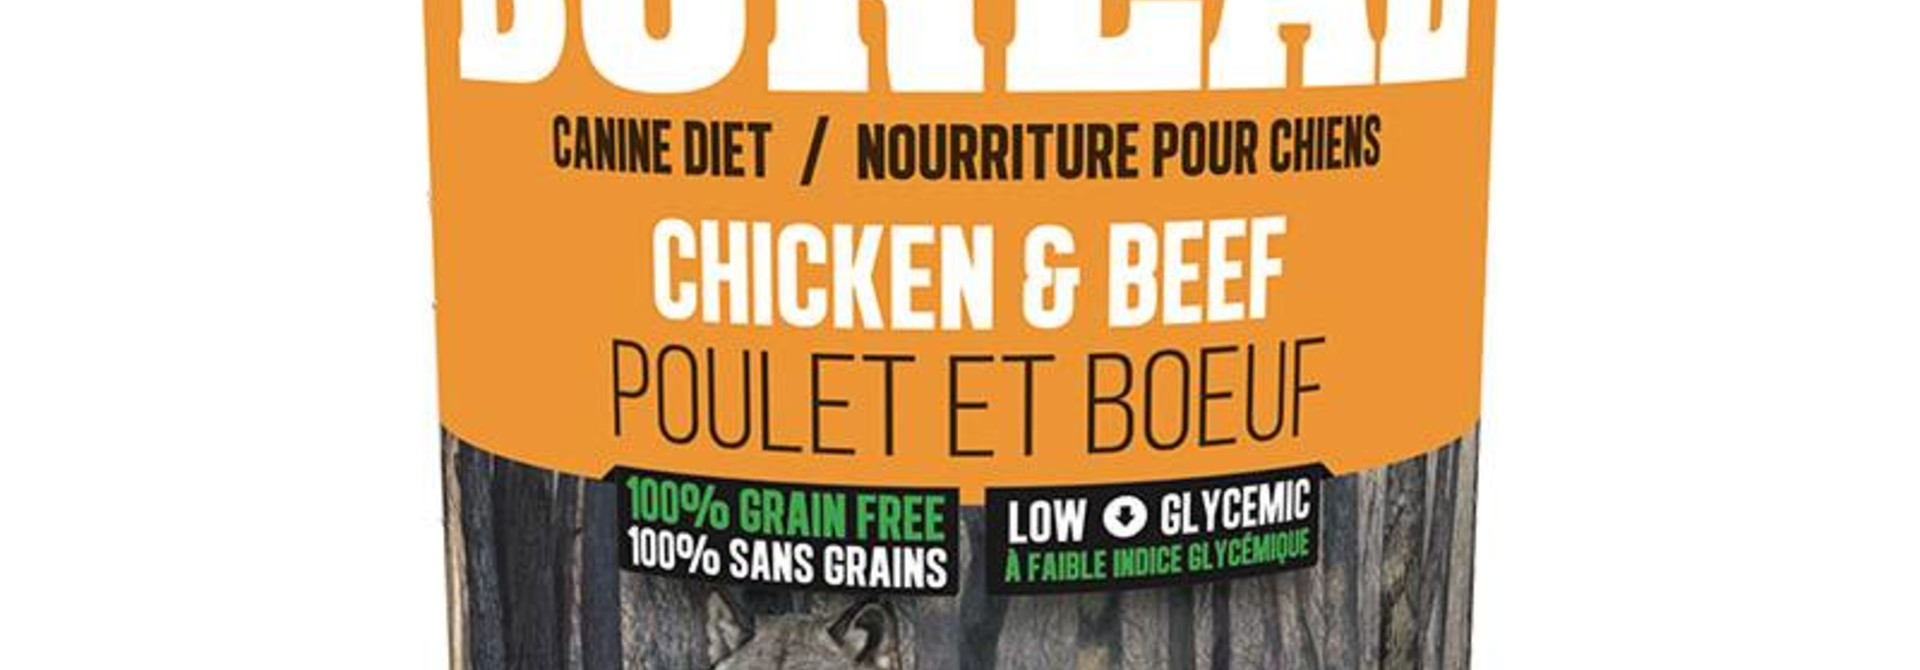 Boreal Dog Chicken & Beef 690g